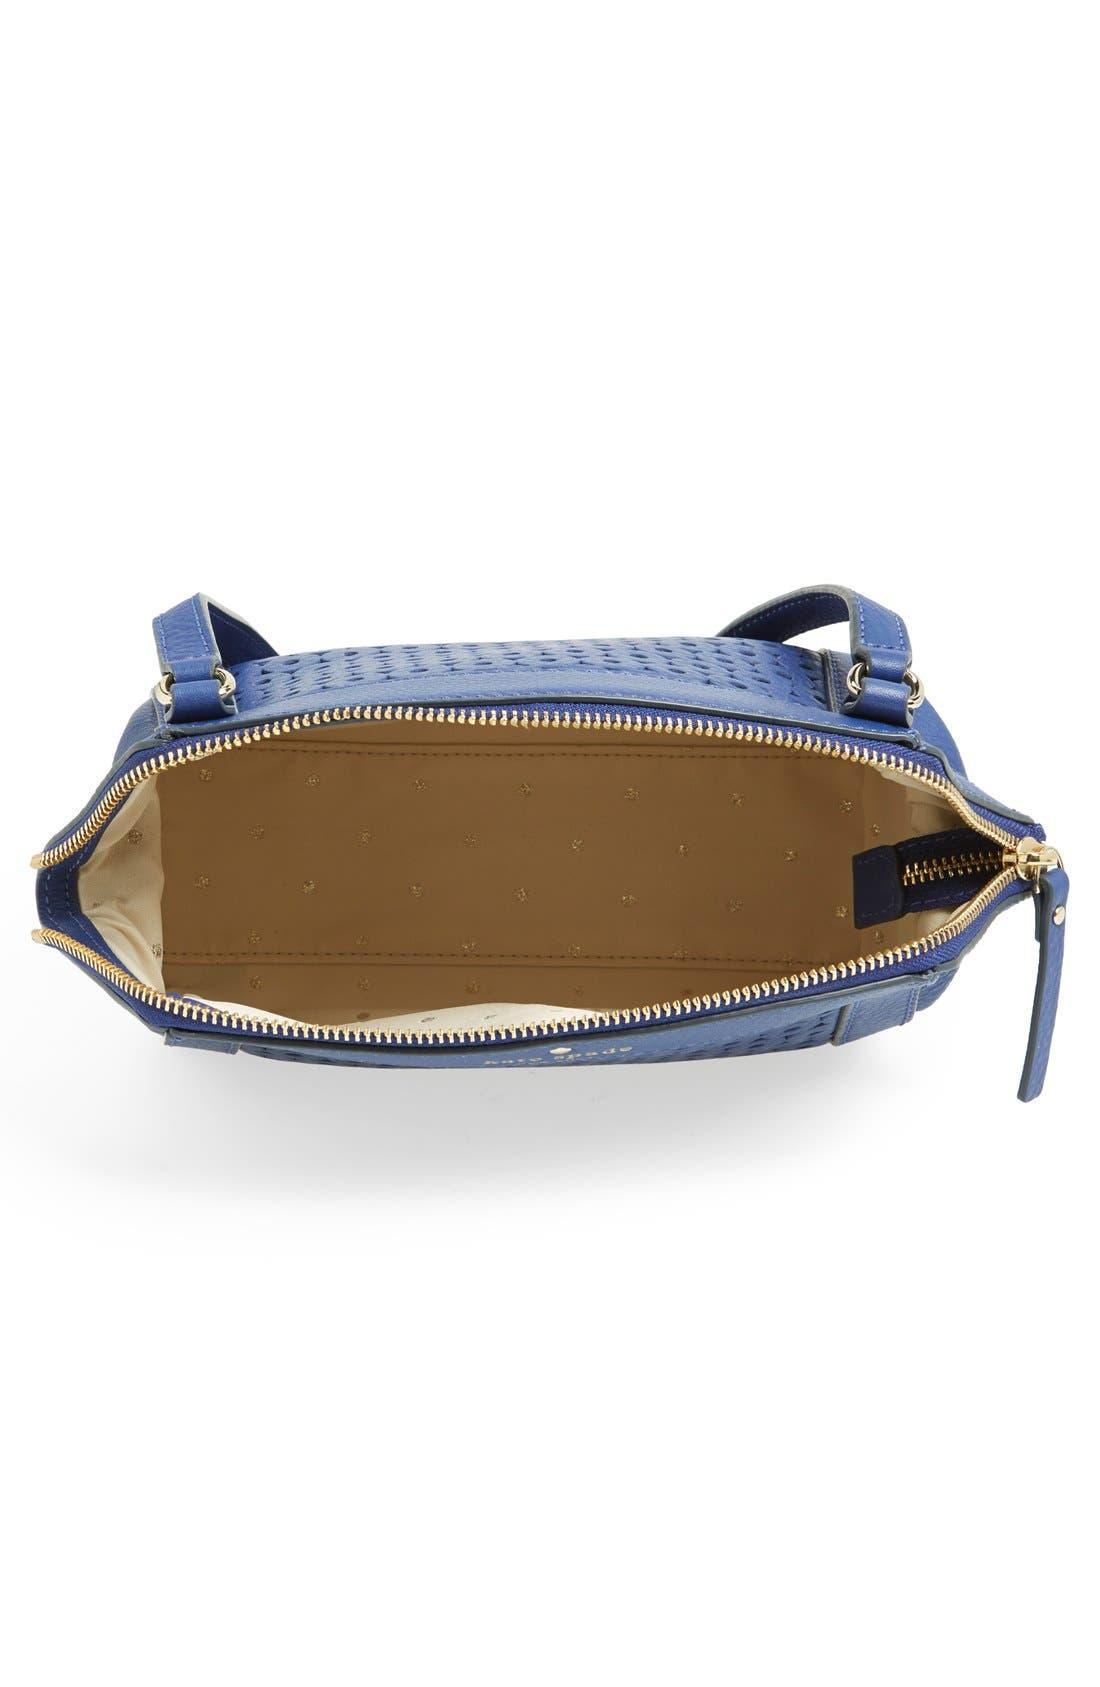 Alternate Image 3  - kate spade new york 'mercer isle - sienna' crossbody bag